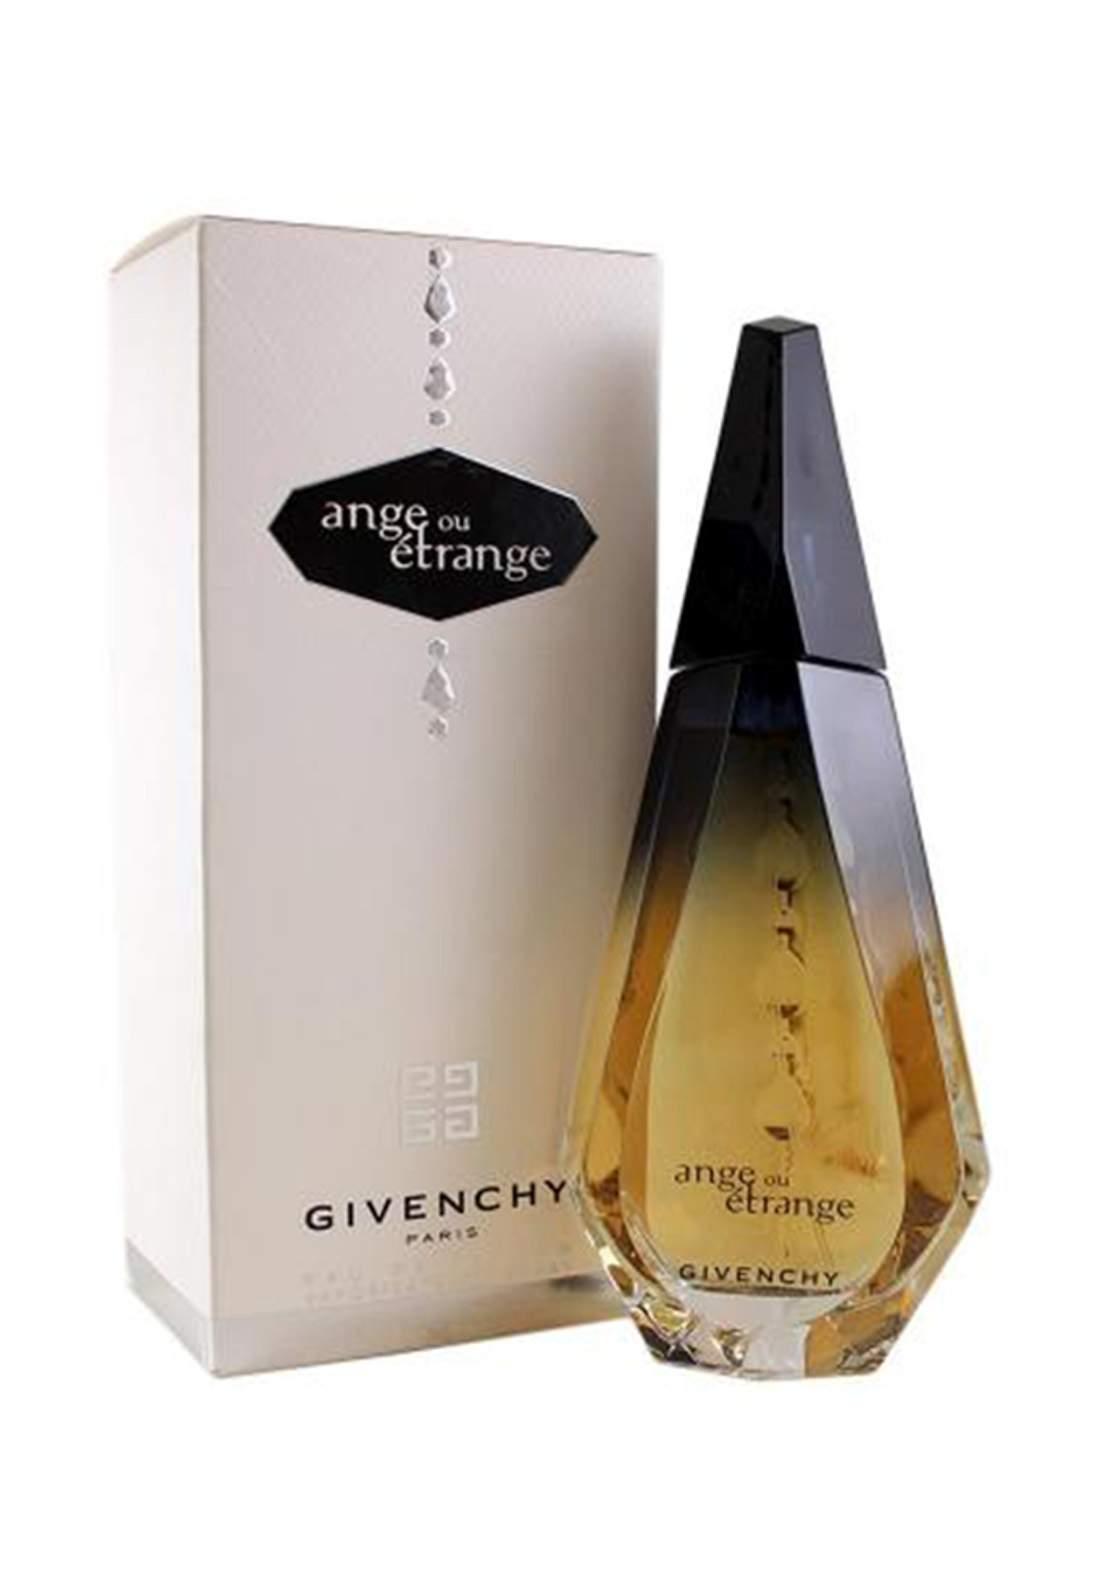 Ange Ou Etrange By Givenchy For Women Eau De Parfum Spray 50 ml - عطر نسائي